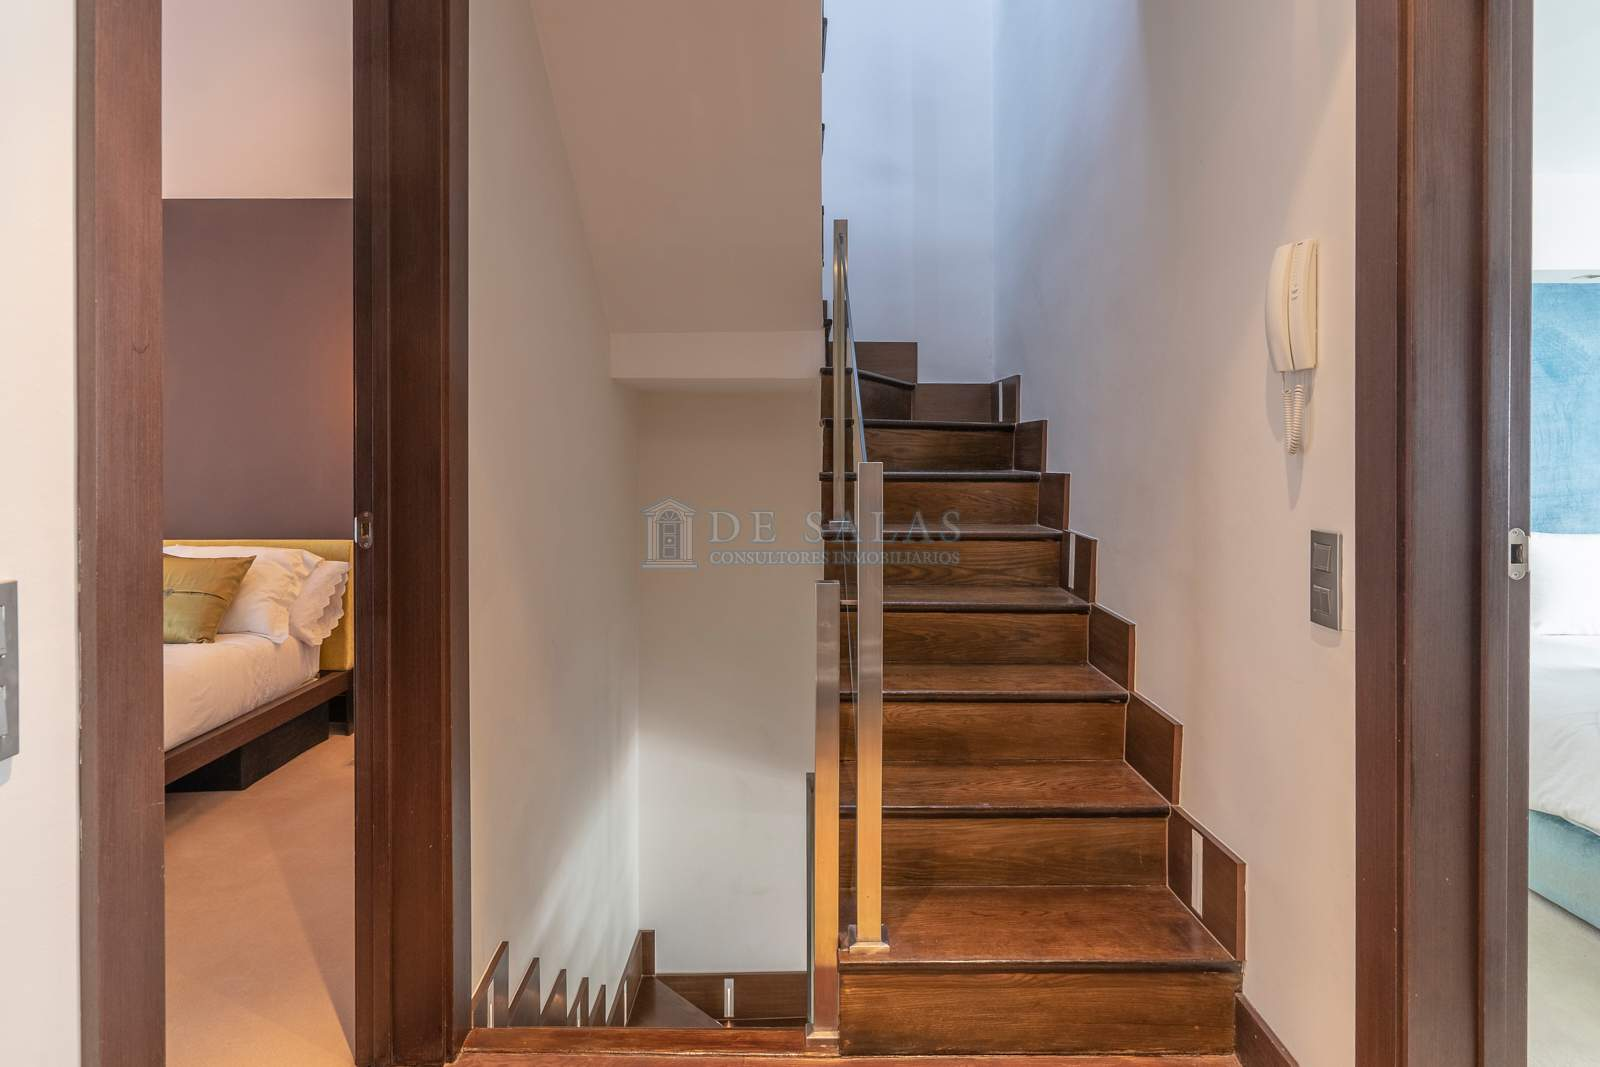 Escalera-21 House Soto de la Moraleja